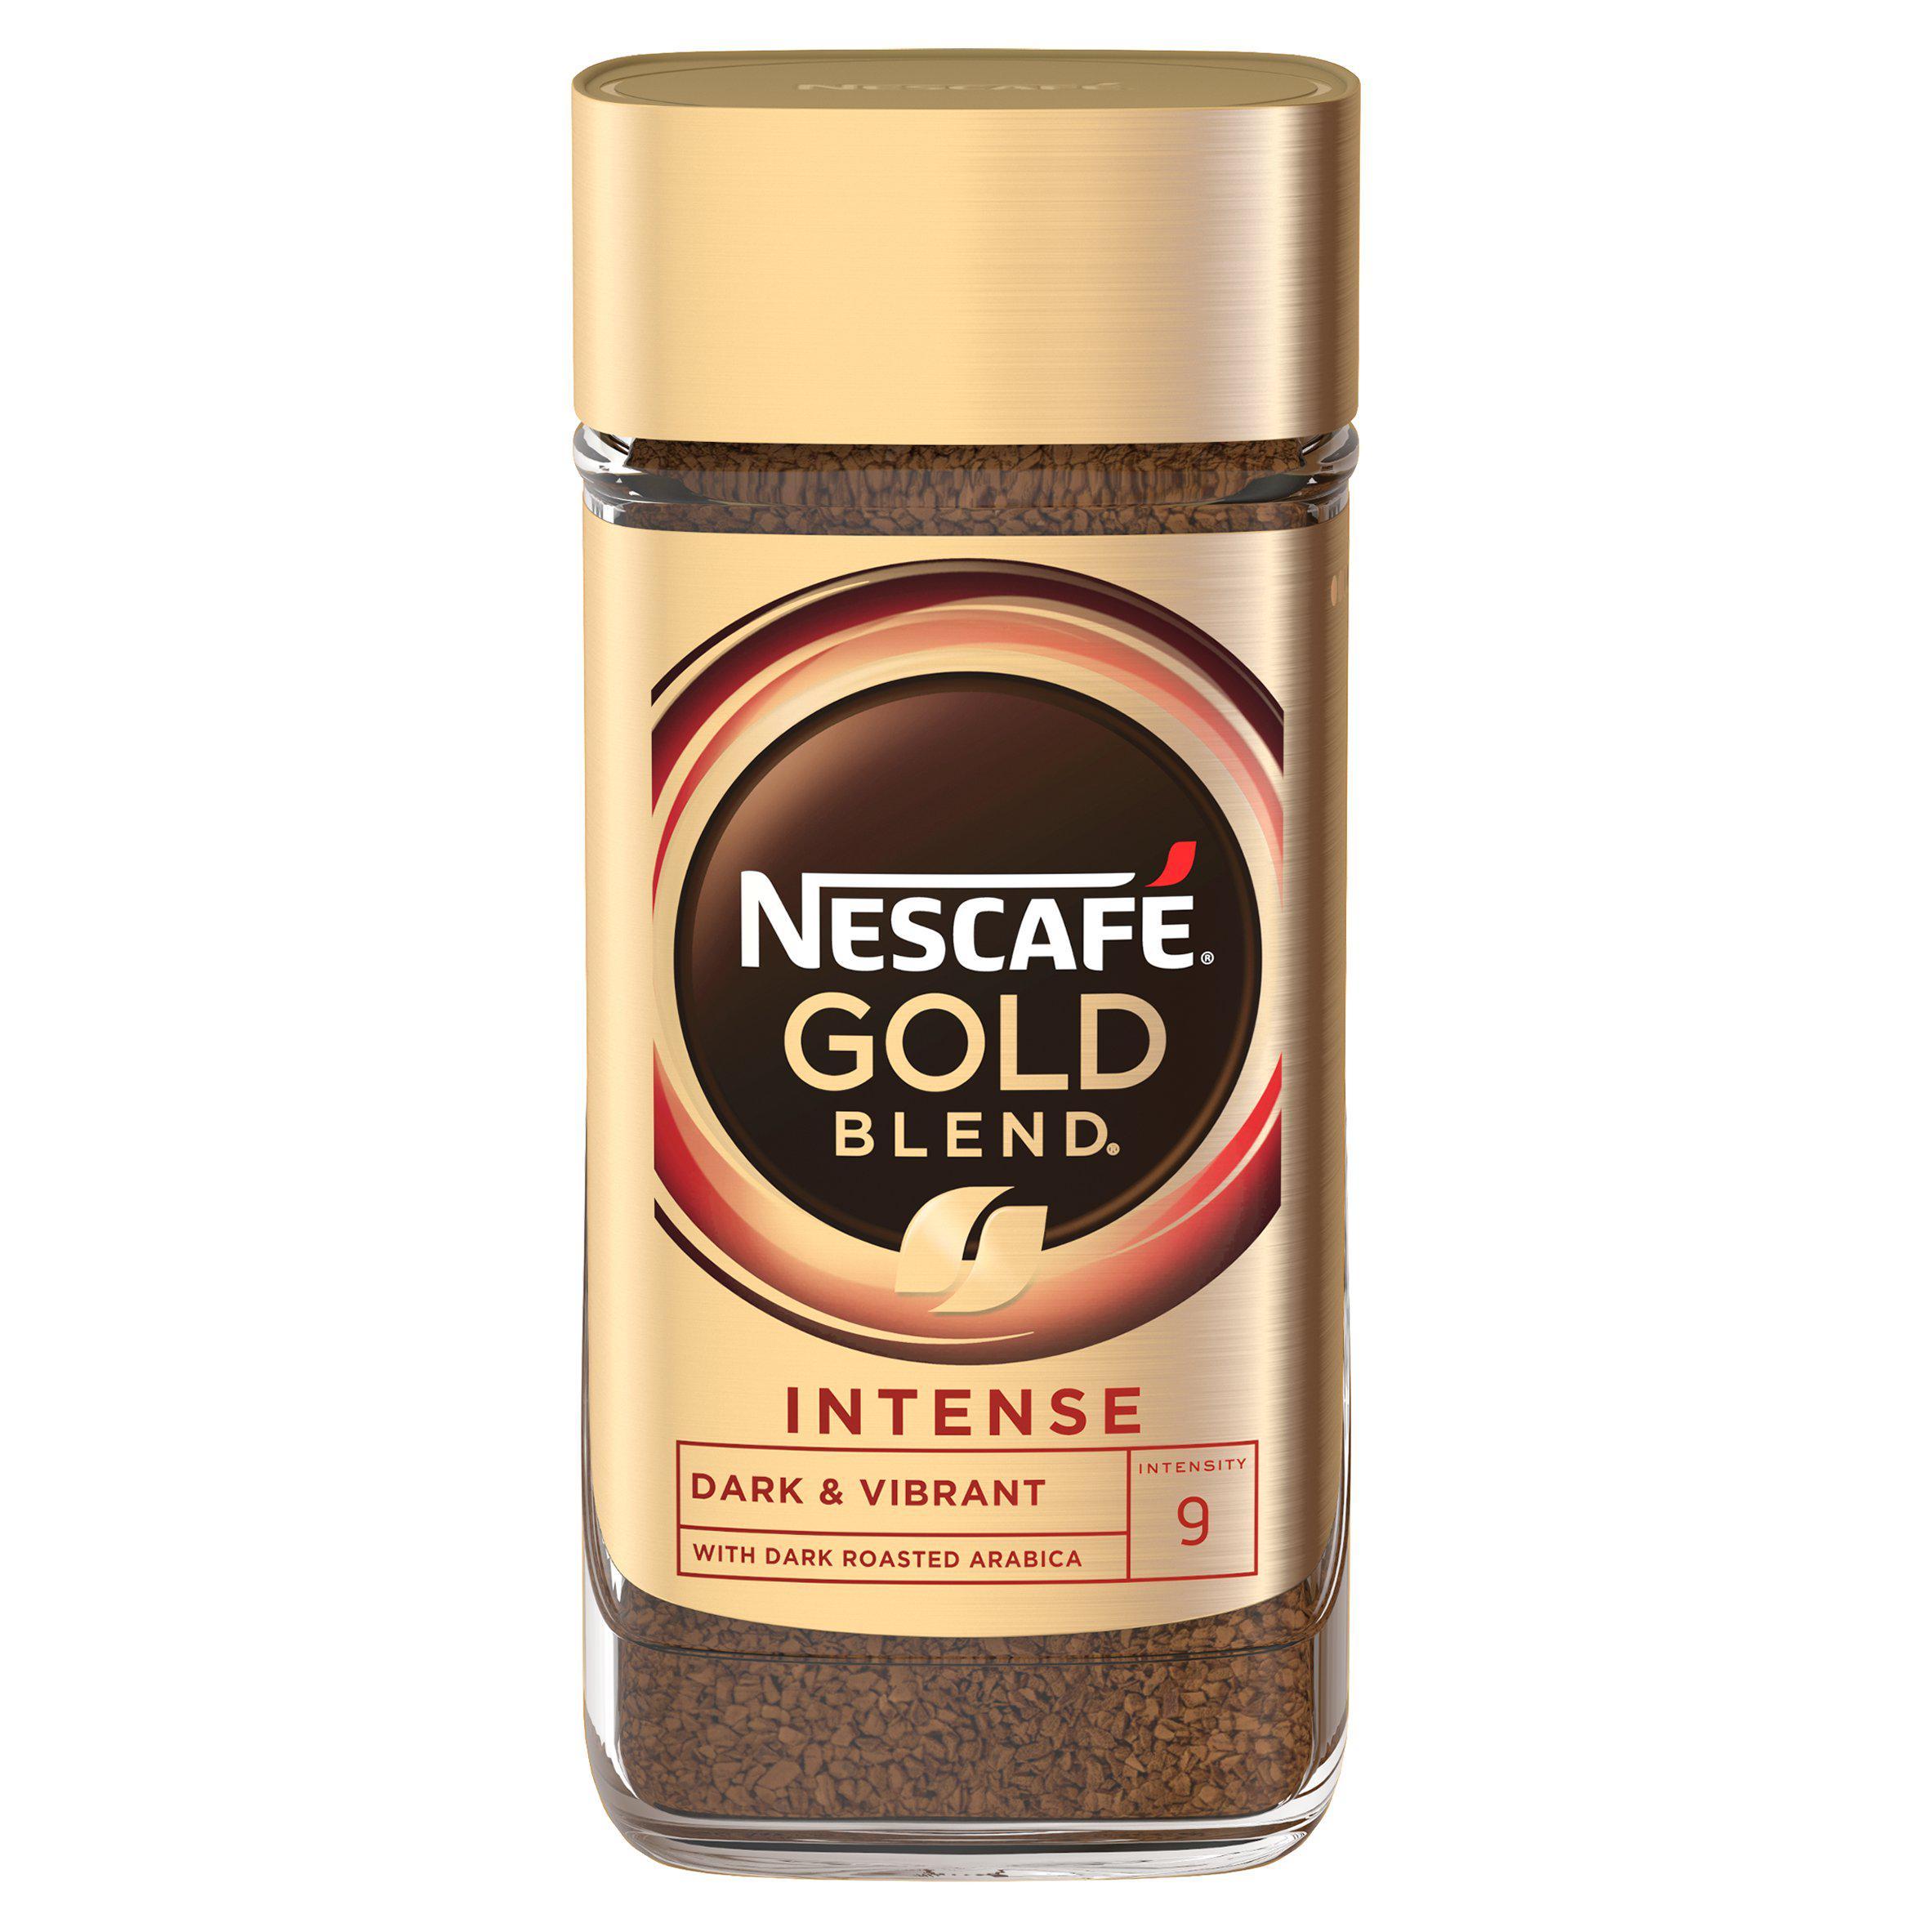 Nescafé Gold Blend Intense Instant Coffee 200g £4 @ Sainsbury's